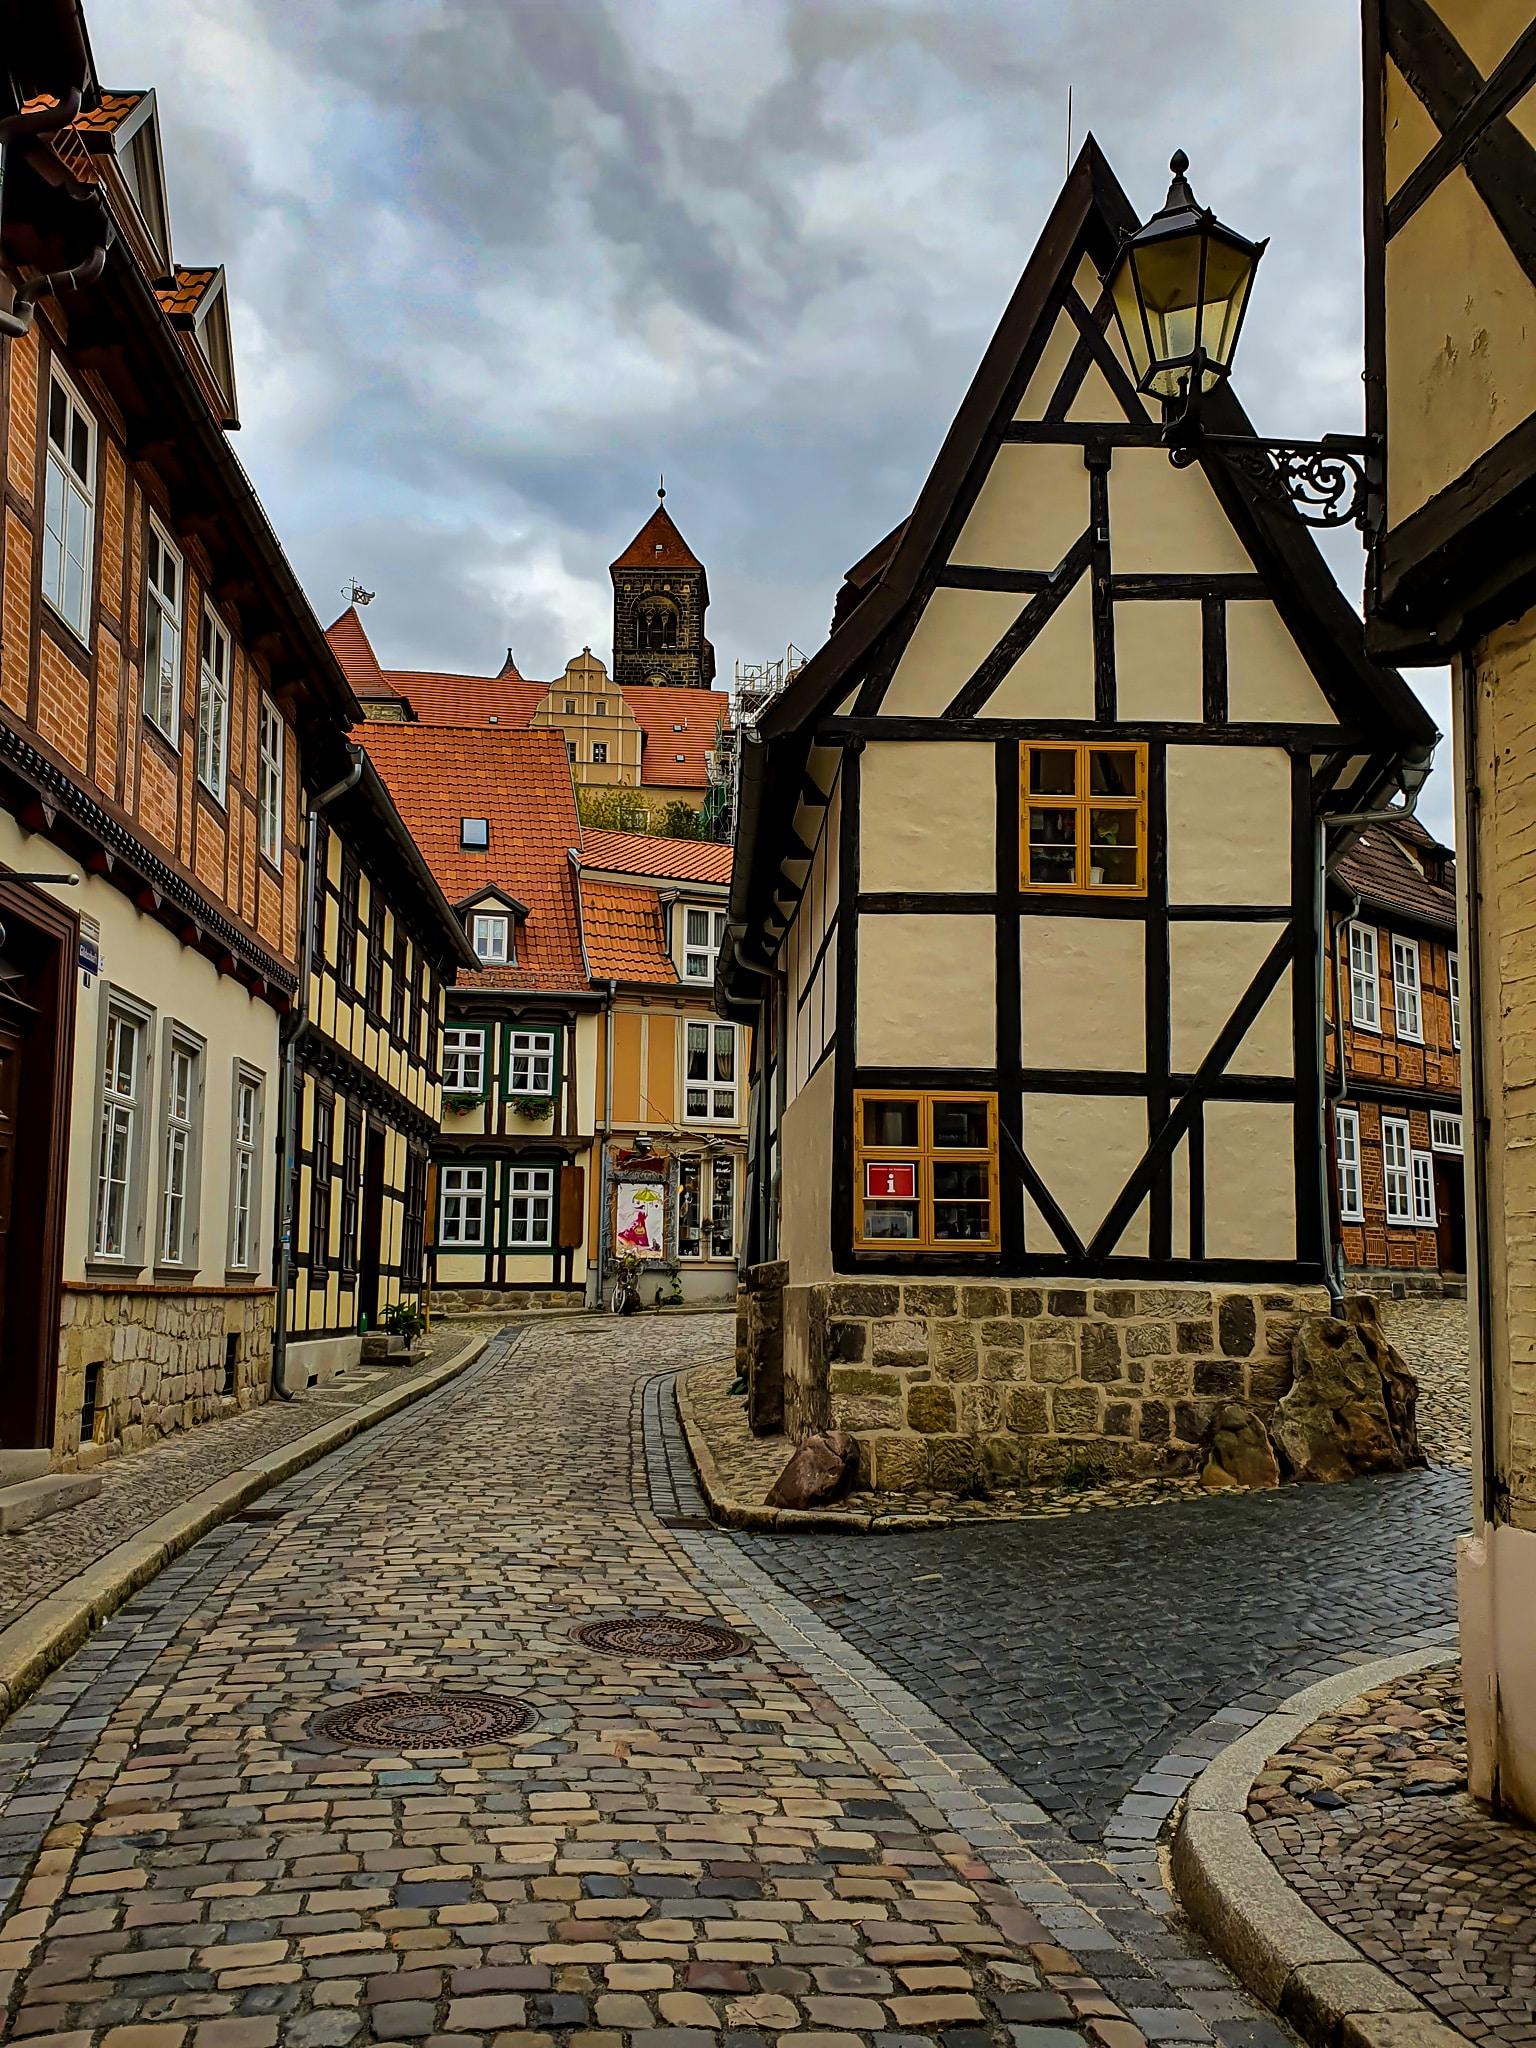 Ausflugsziel Harz Quedlinburg